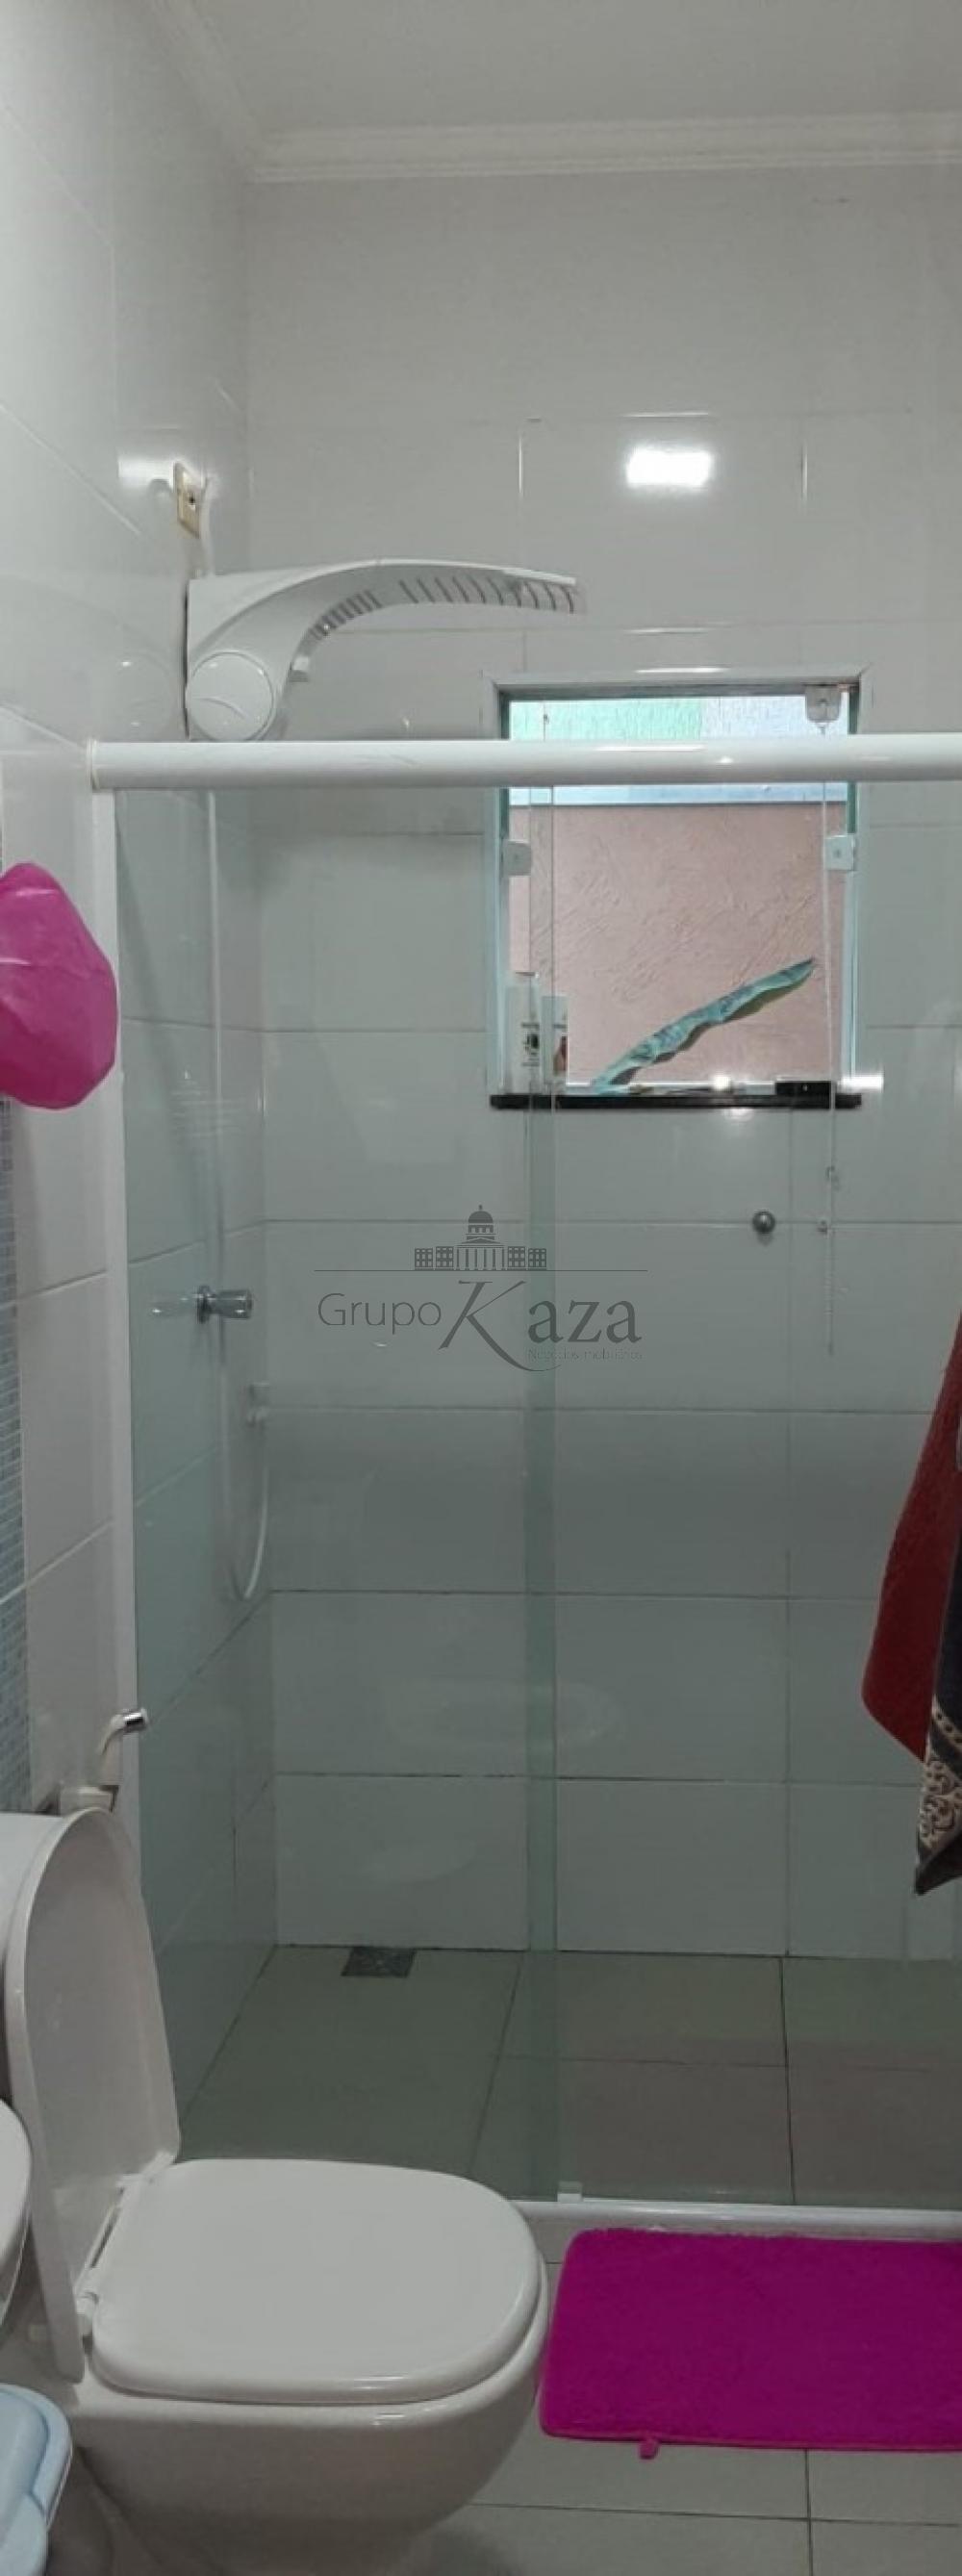 alt='Comprar Casa / Térrea em Caraguatatuba R$ 590.000,00 - Foto 10' title='Comprar Casa / Térrea em Caraguatatuba R$ 590.000,00 - Foto 10'